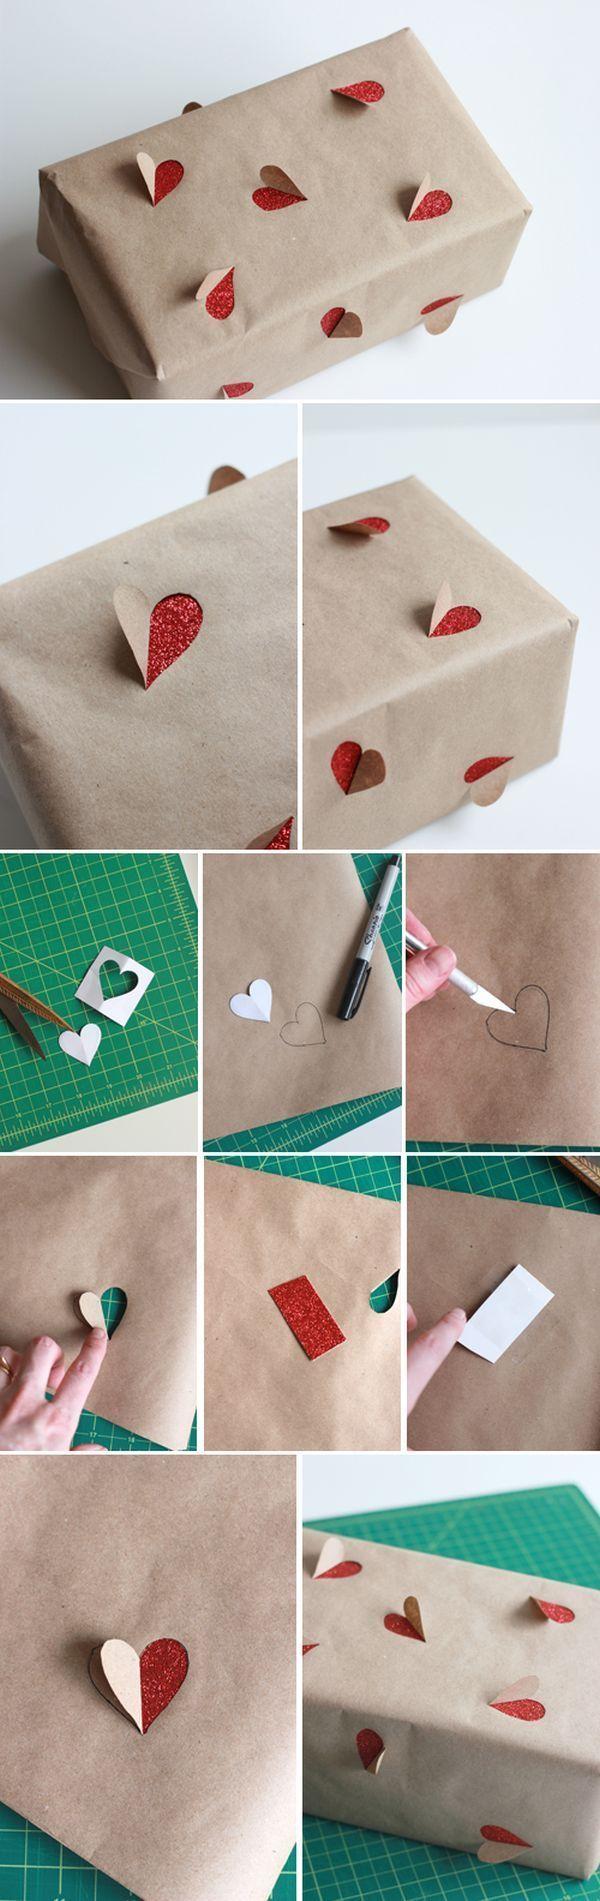 Super cute romantic themed wrapping idea, perfect for Valentine's Day / anni...